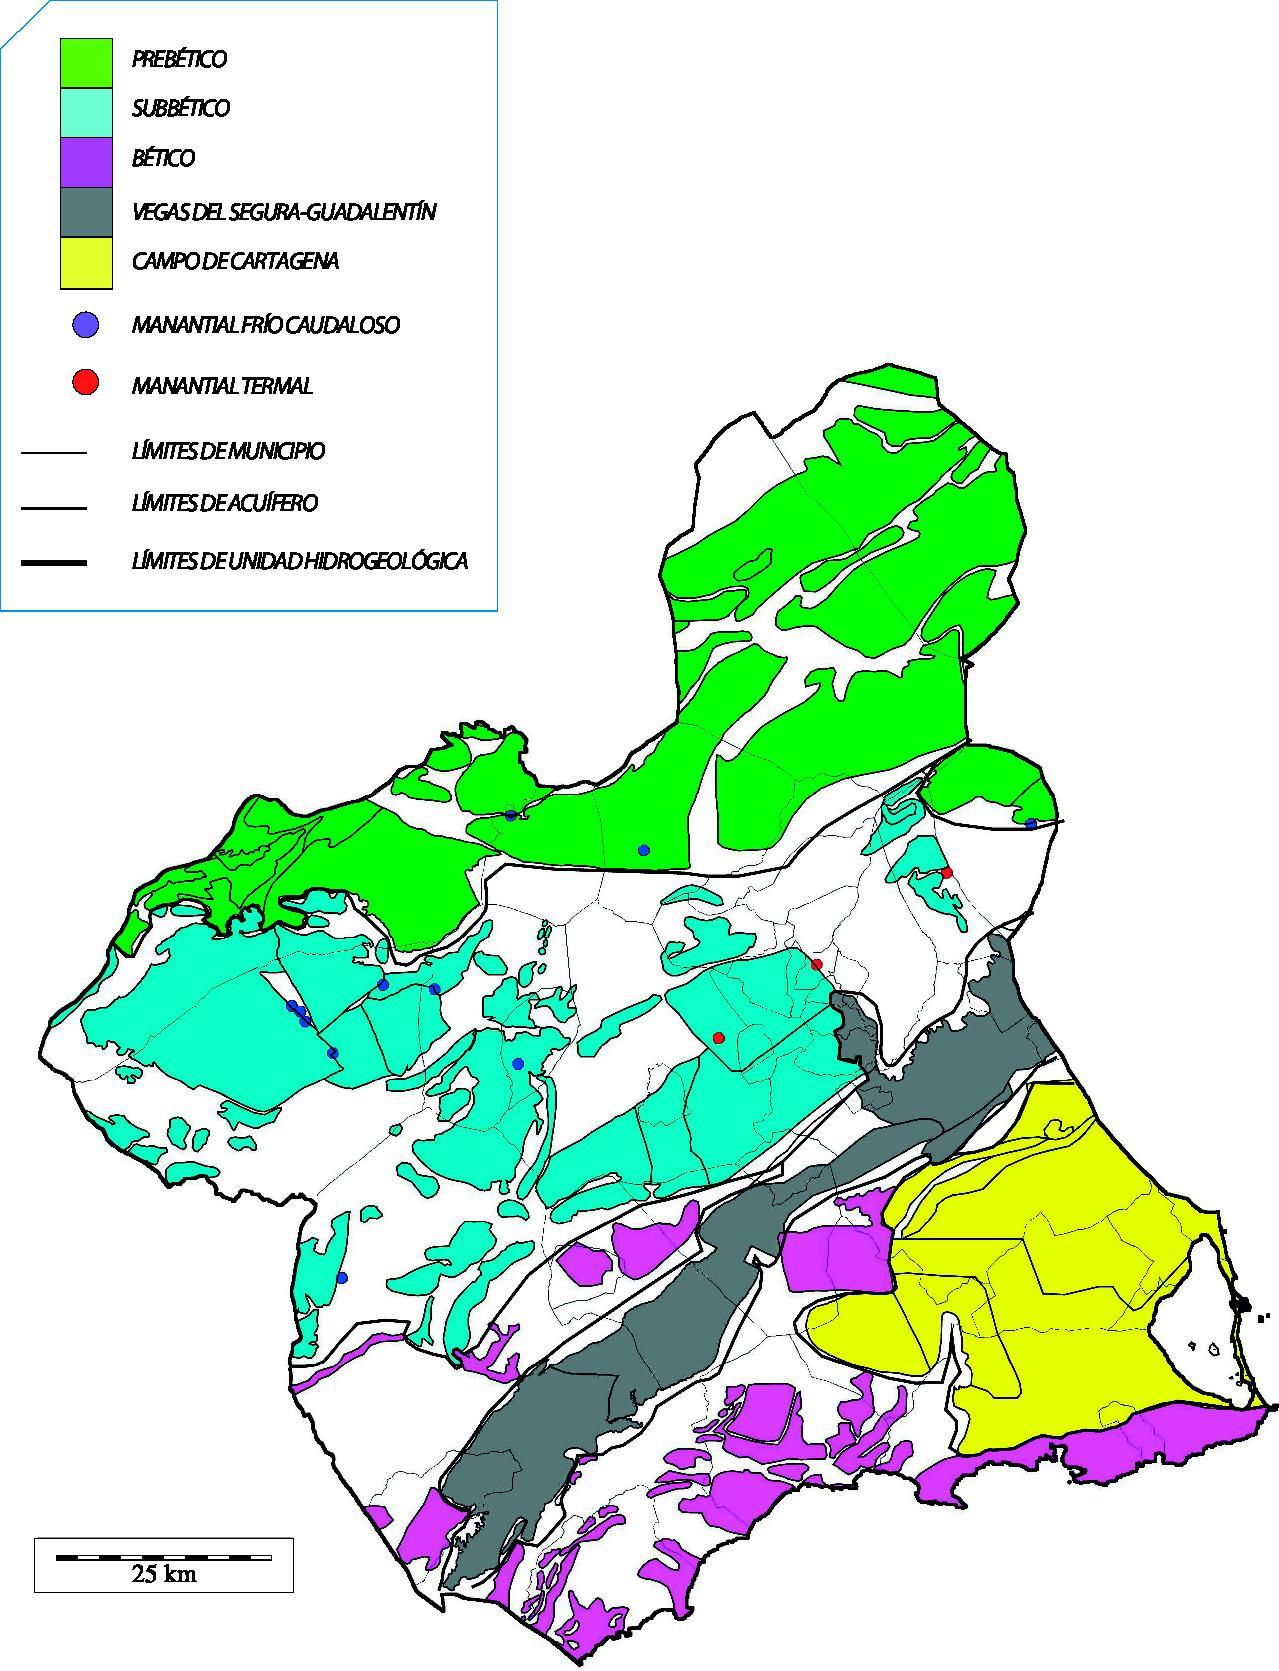 Hydrogeological units and aquifers in the Region of Murcia